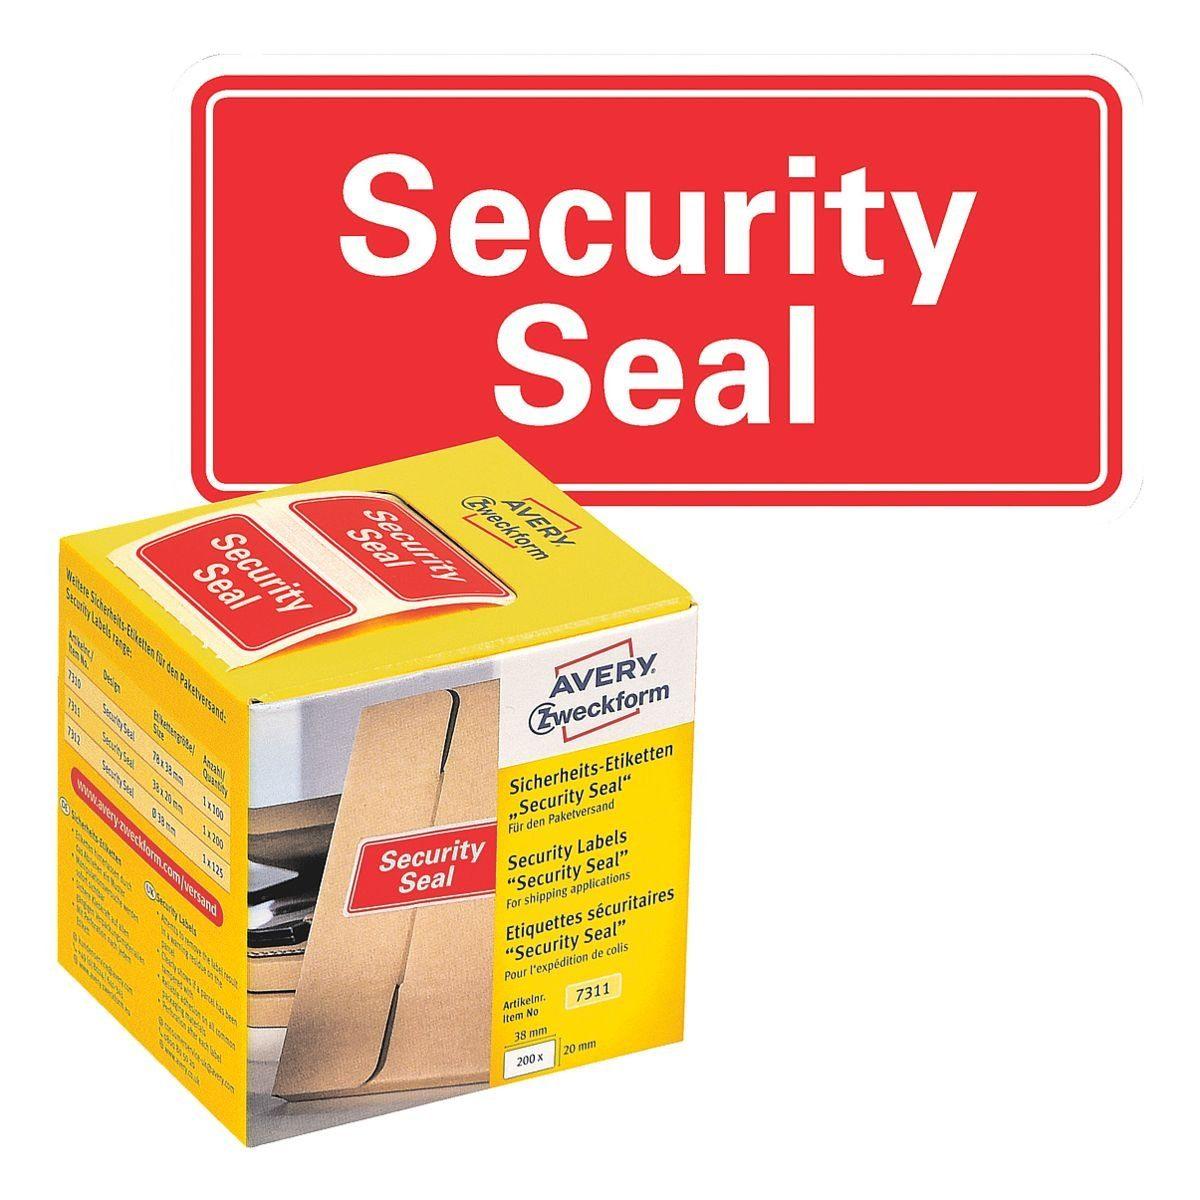 ZWECKFORMAVERY Sicherheitssigel 7311 38 x 20 mm (B/L) »Security Seal«